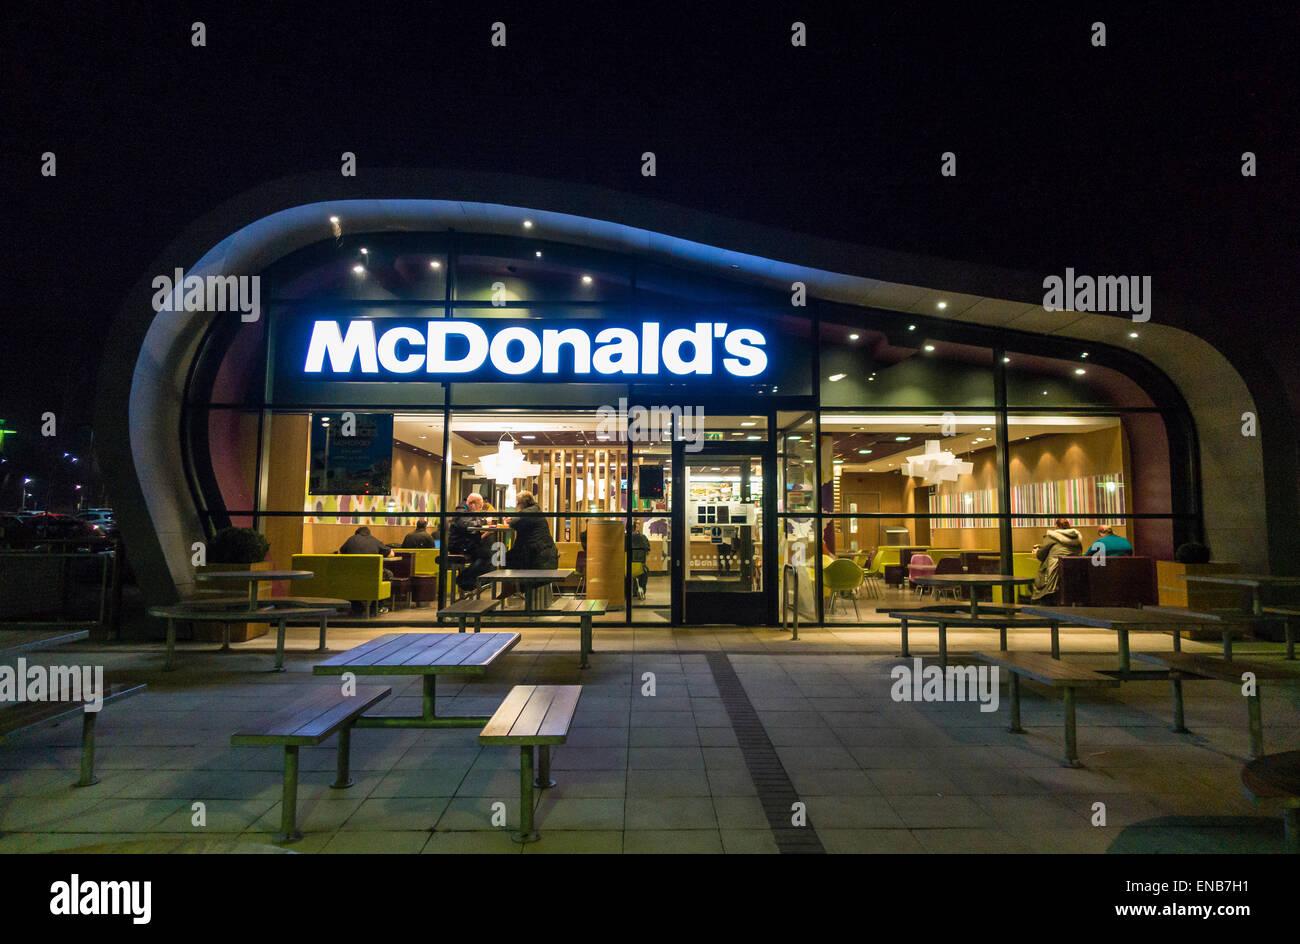 Mcdonalds Fast Food Restaurant at Night Ashford Kent - Stock Image